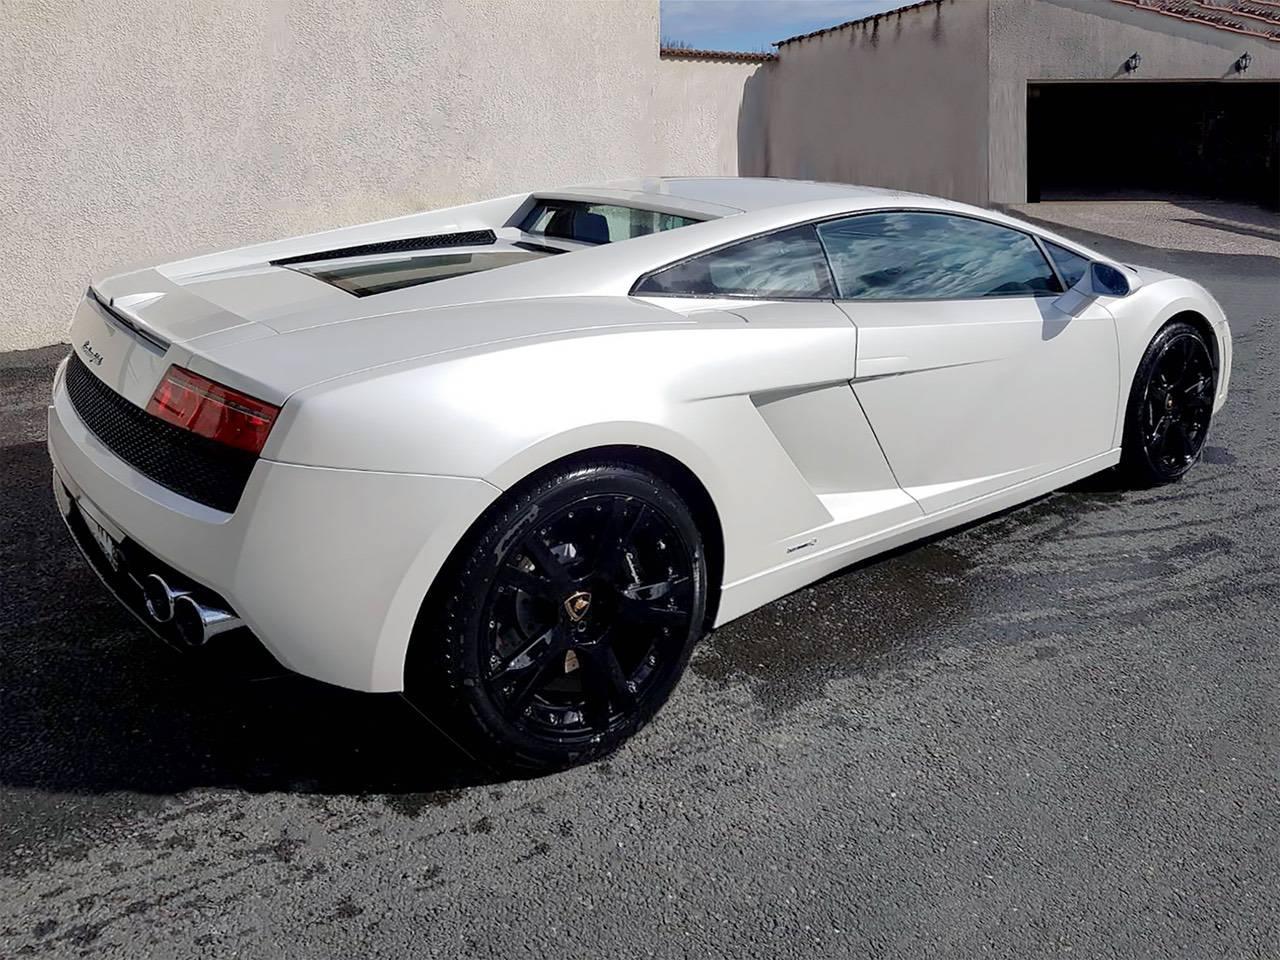 Lamborghini-Gallardo-LP-560-4-2